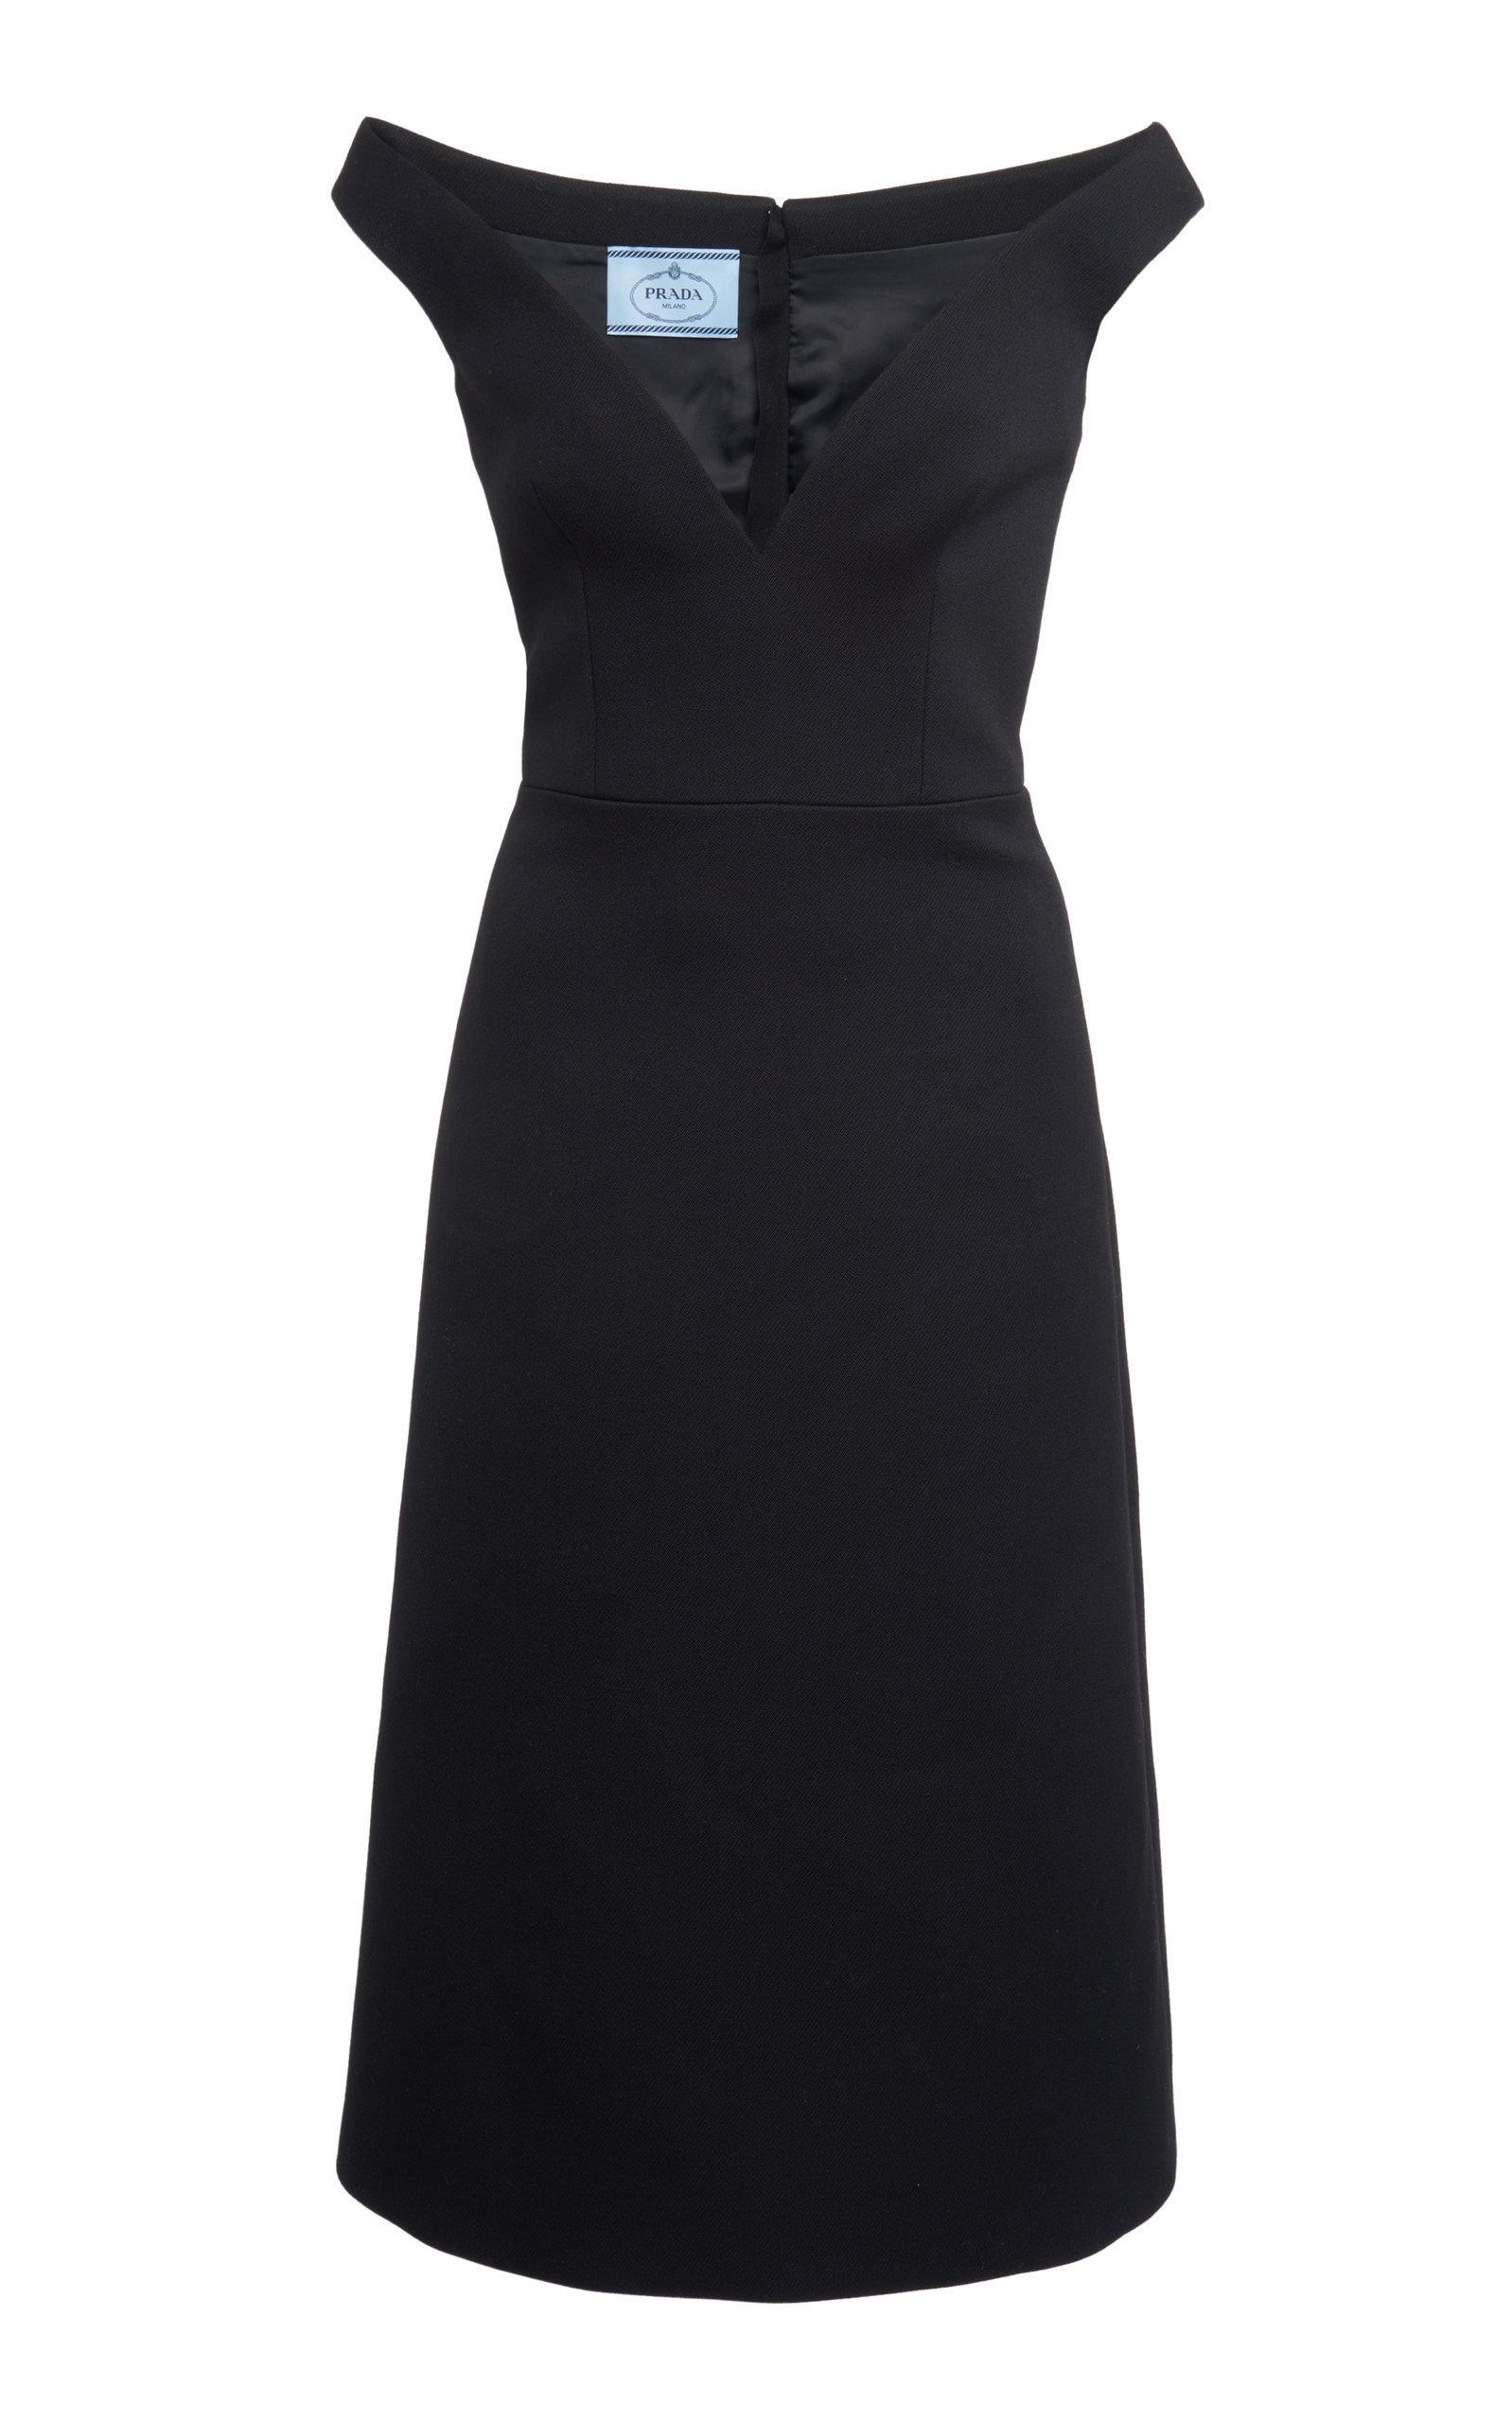 PRADA-black-dress-lbd.jpg